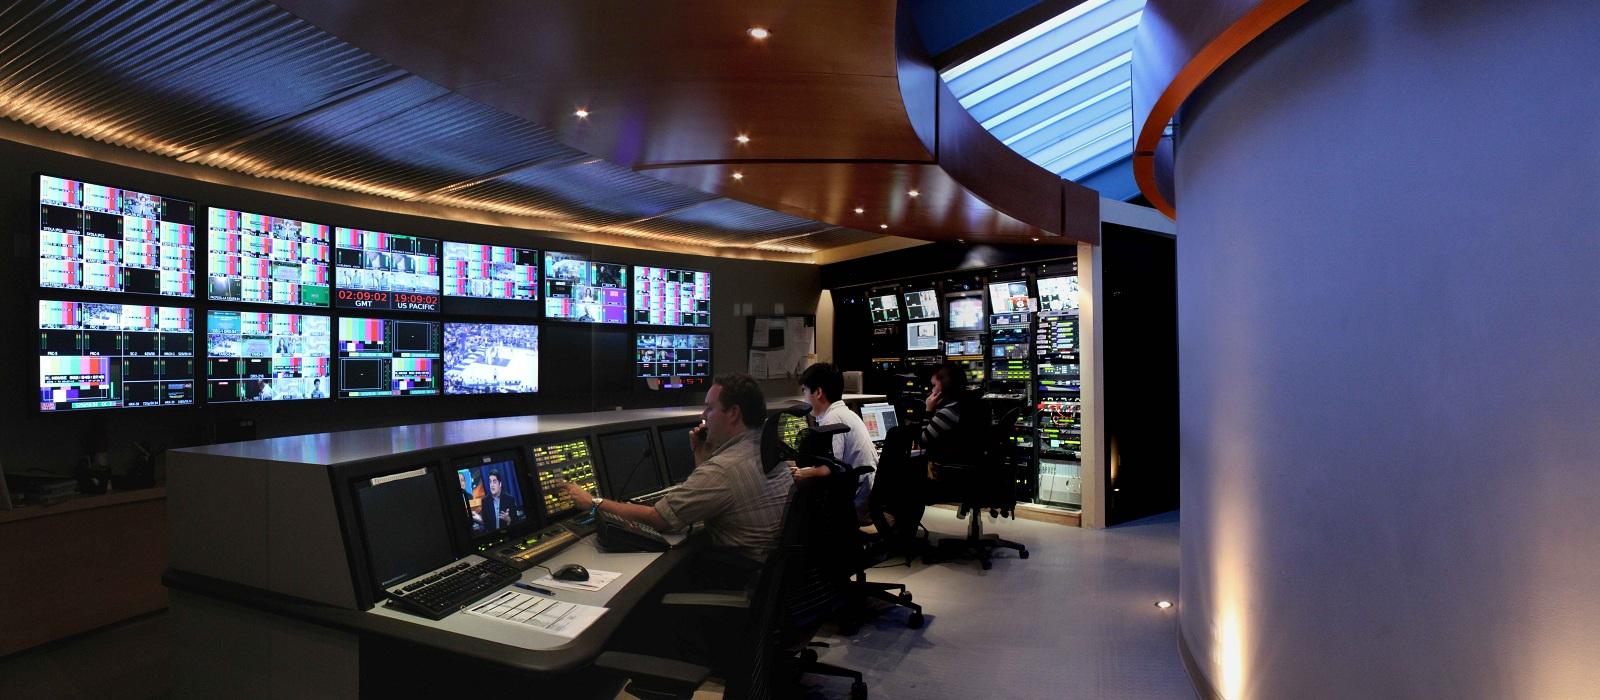 TV monitoring